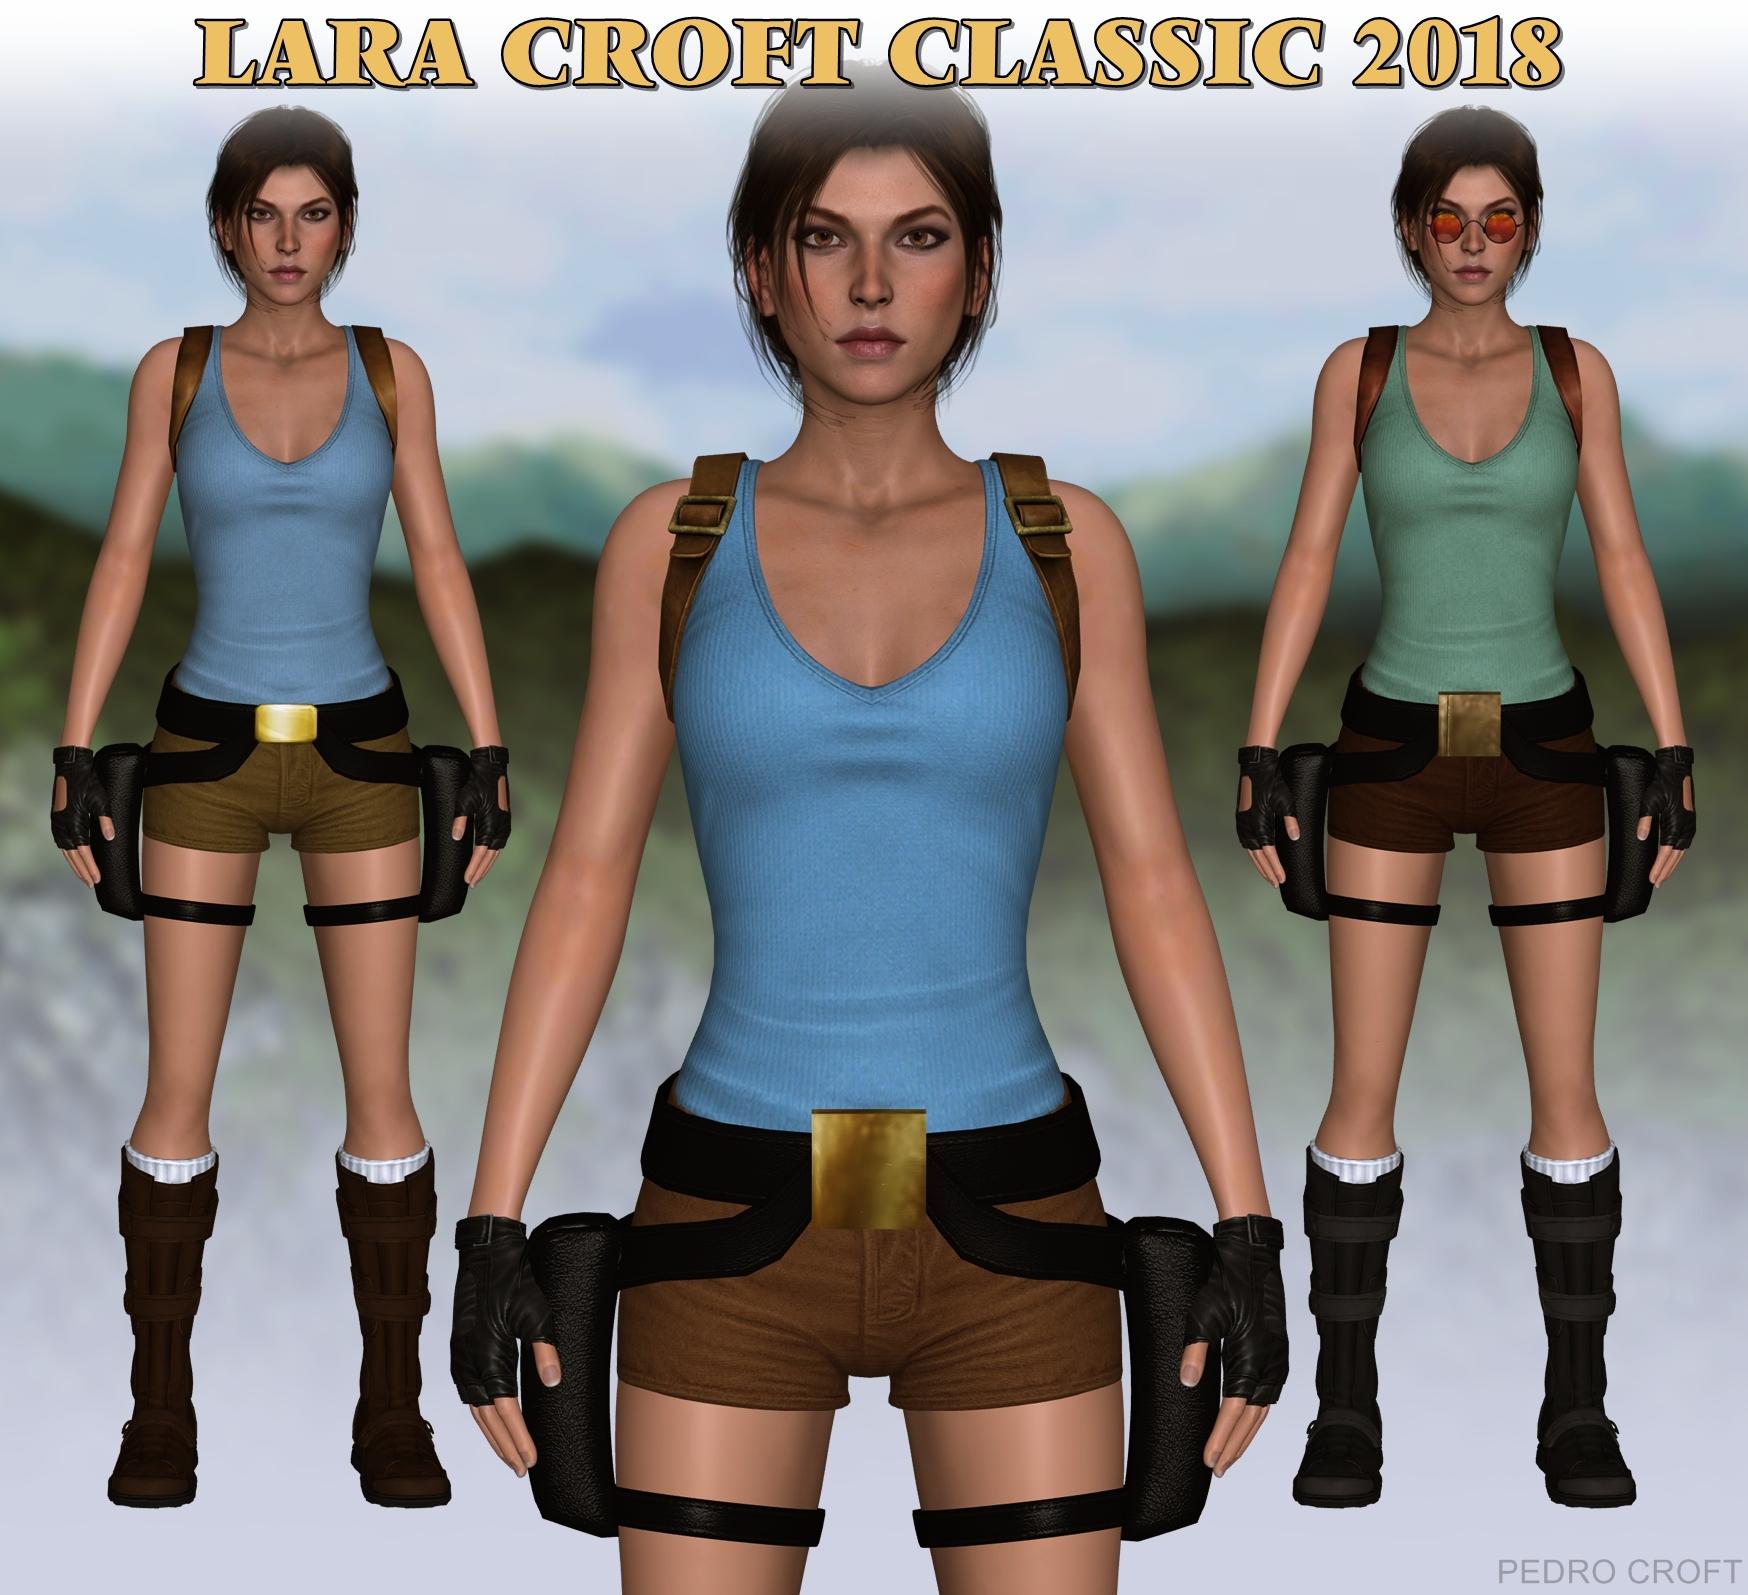 Lara Croft Classic 2018 - XPS DOWNLOAD (updated)